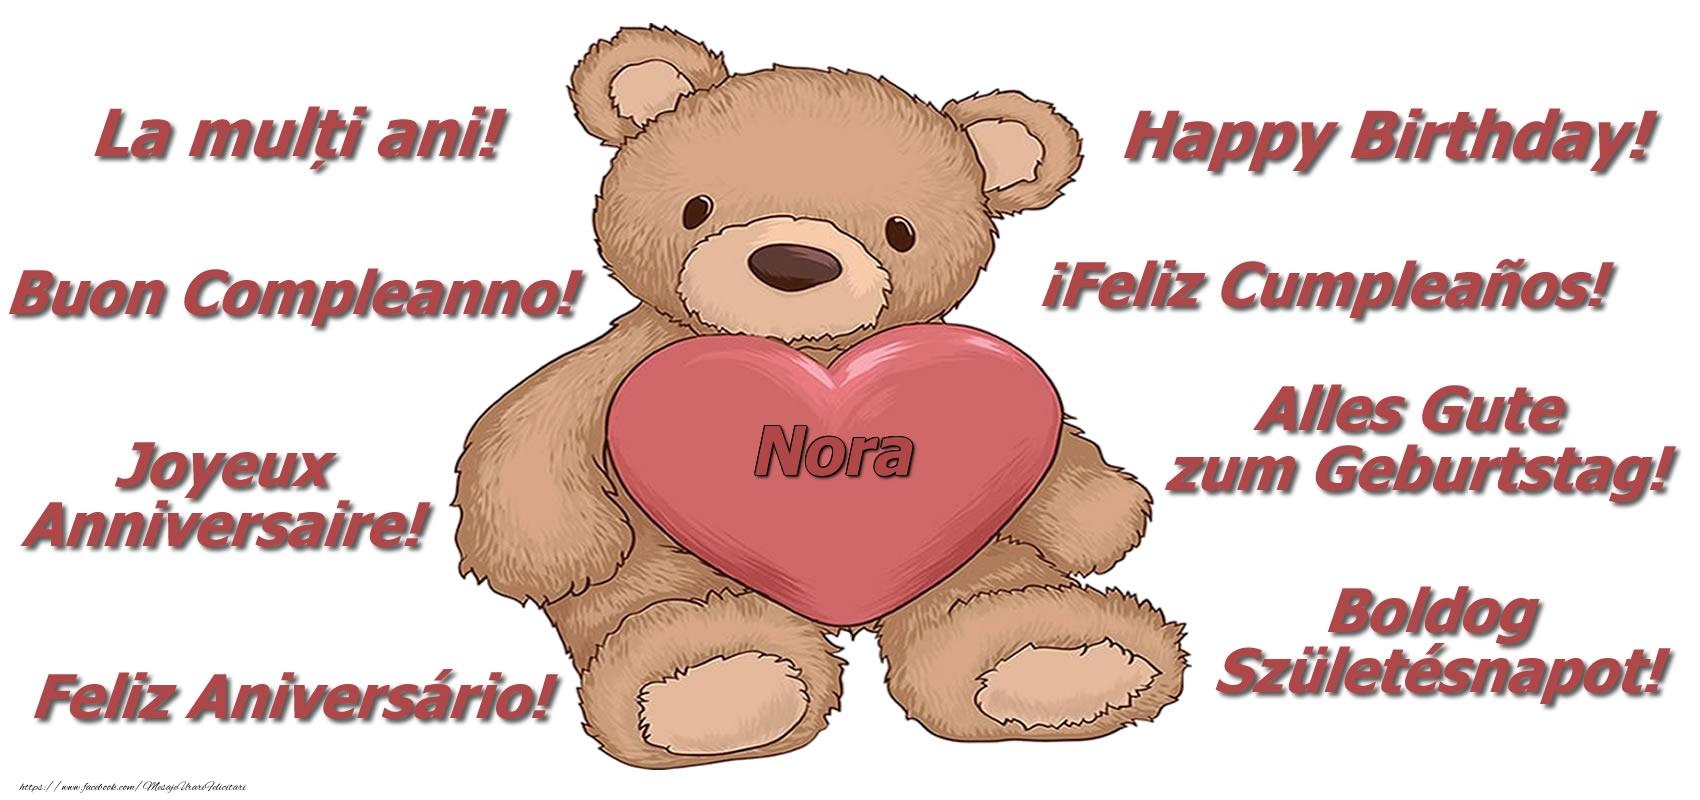 Felicitari de zi de nastere - La multi ani Nora! - Ursulet